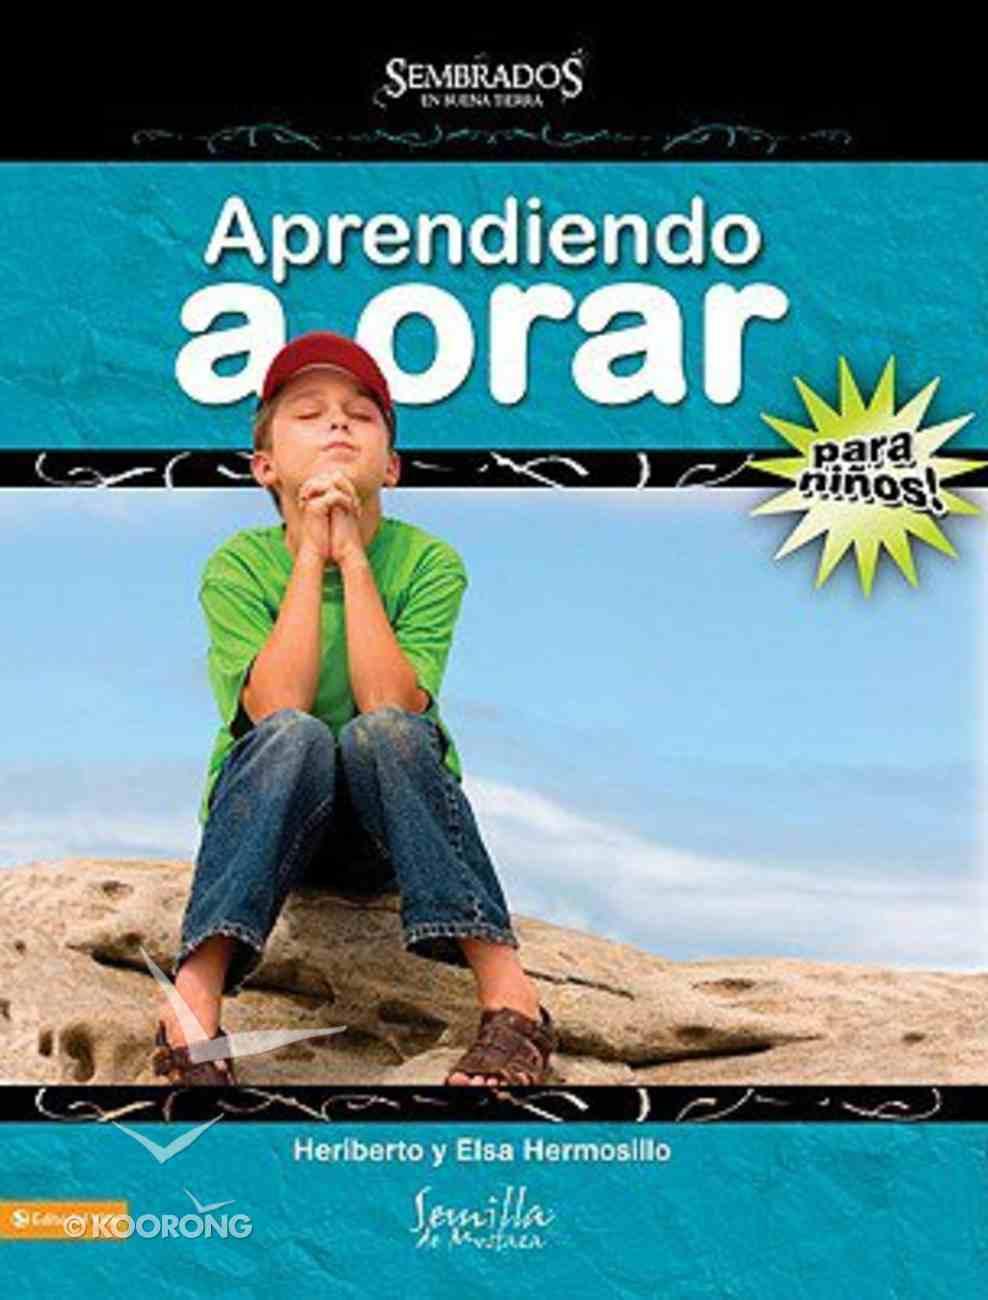 Aprendiendo a Orar Para Ninos (Learning To Pray For Children) Paperback